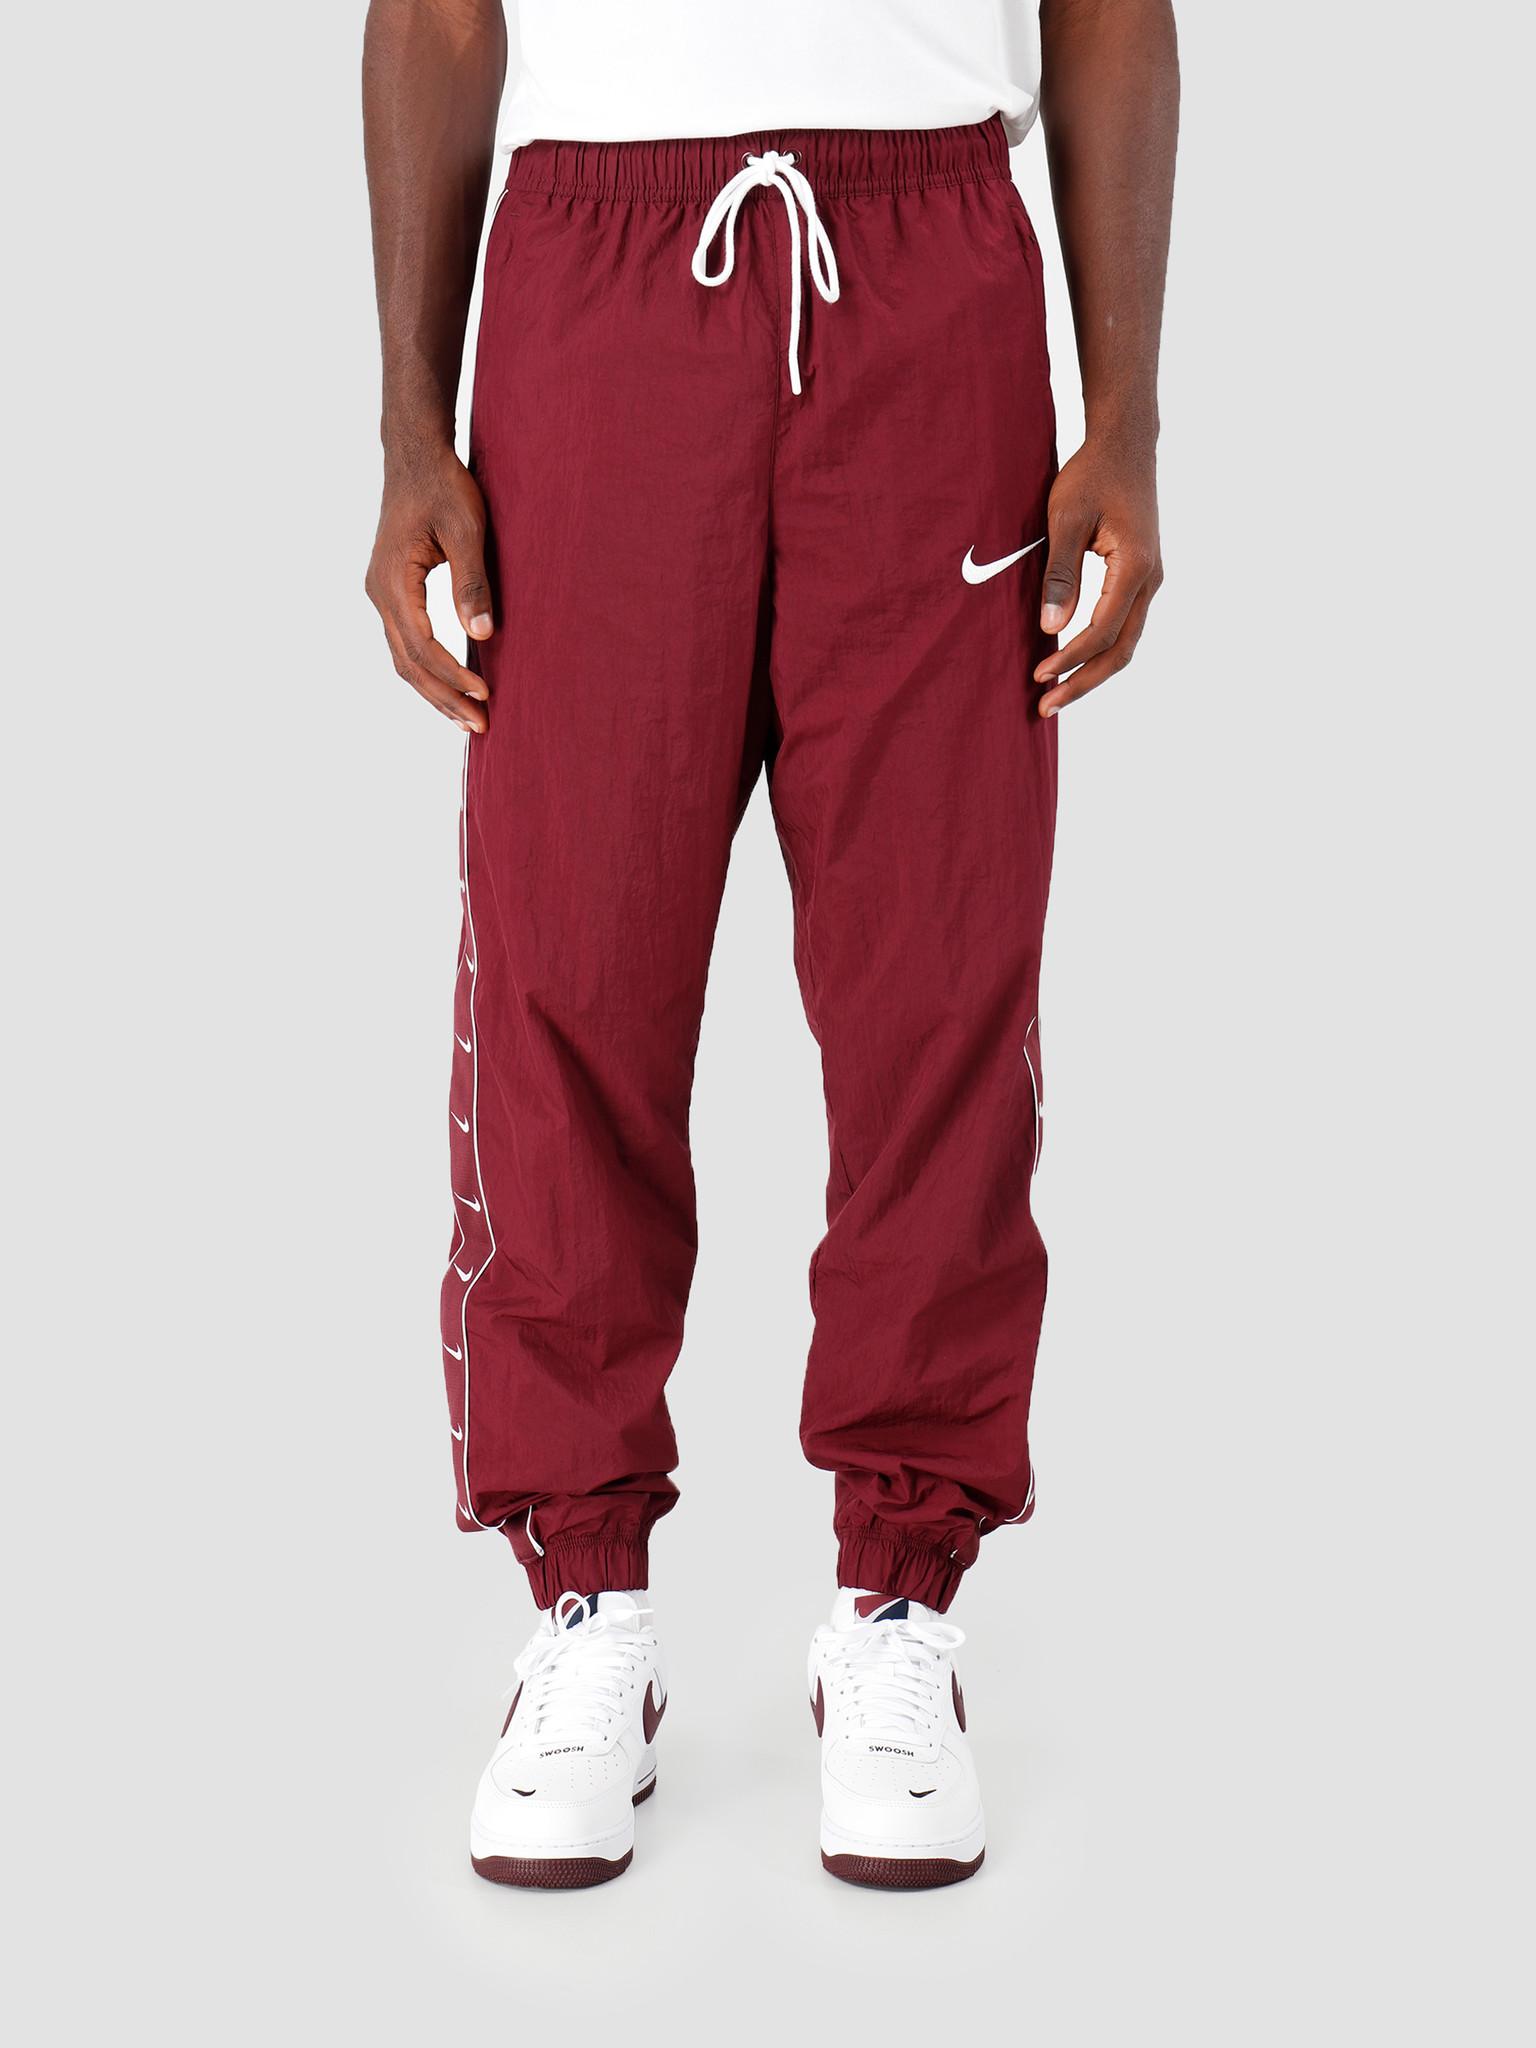 Nike Nike Sportswear Swoosh Pants Night Maroon White Cd0421-681